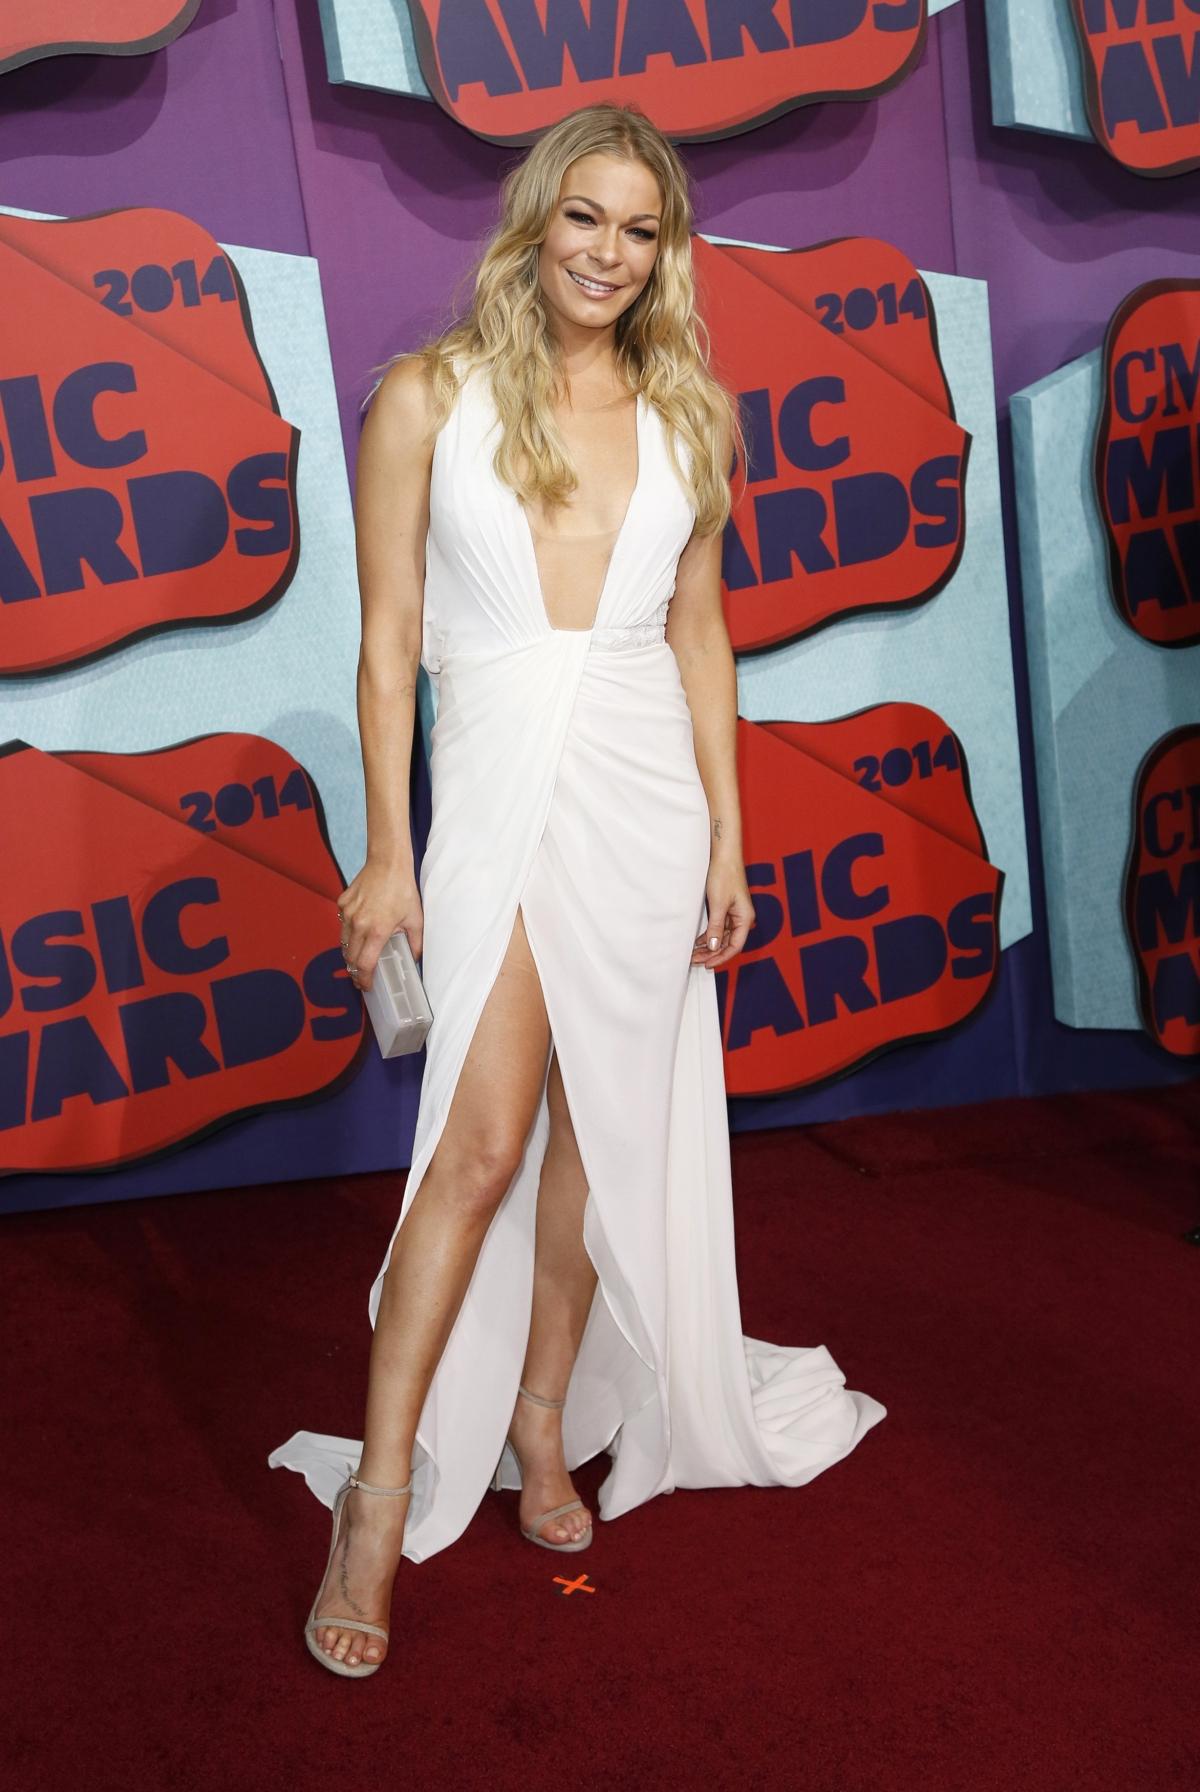 Singer LeAnn Rimes arrives at the 2014 CMT Music Awards in Nashville, Tennessee June 4, 2014.